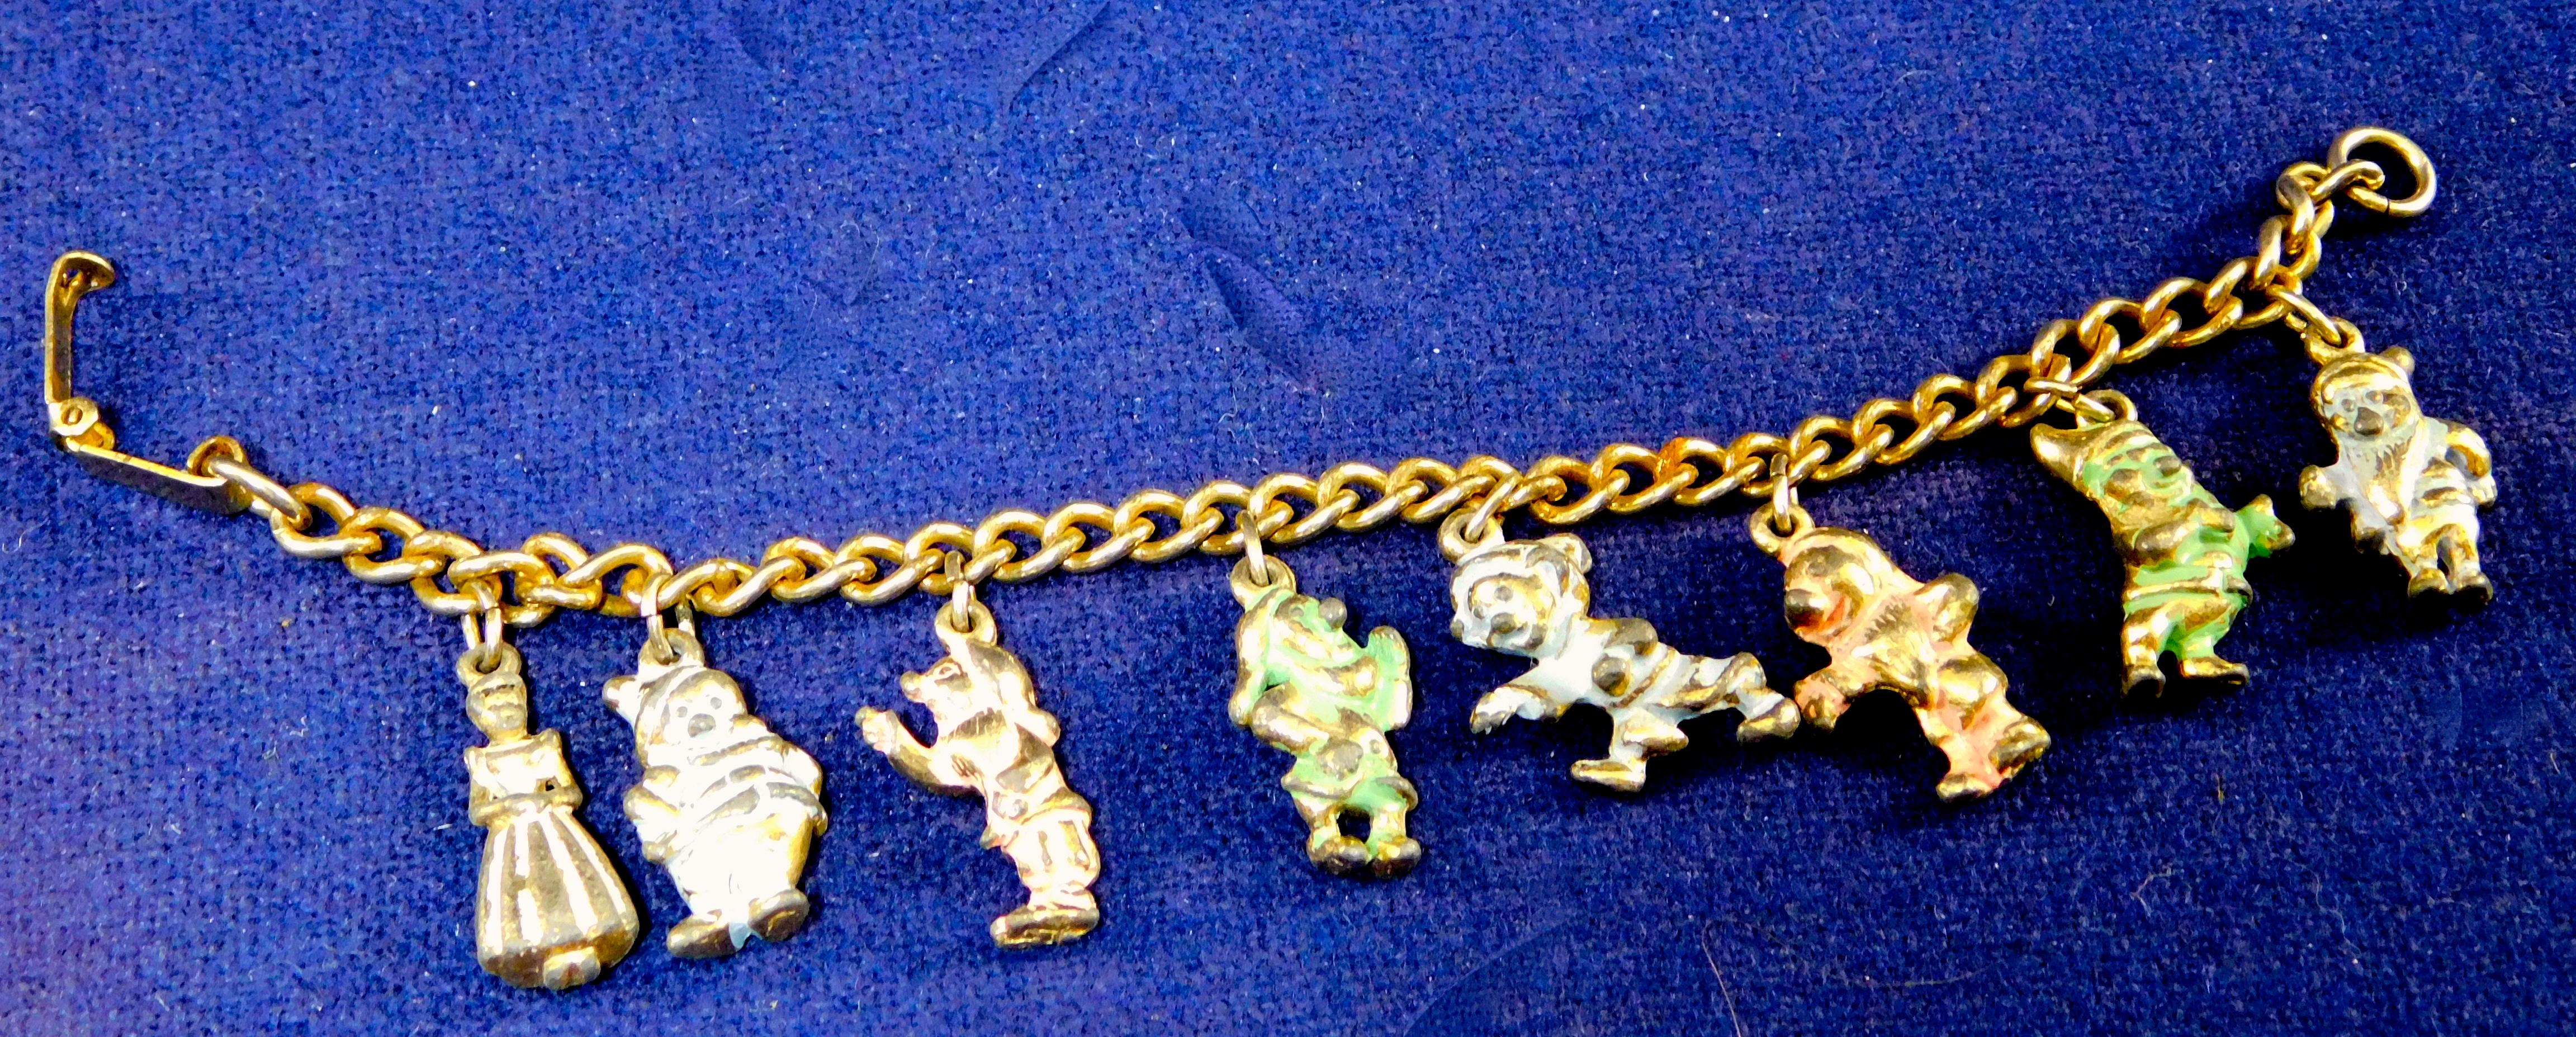 vintage disney snow white and seven dwarfs charm bracelet